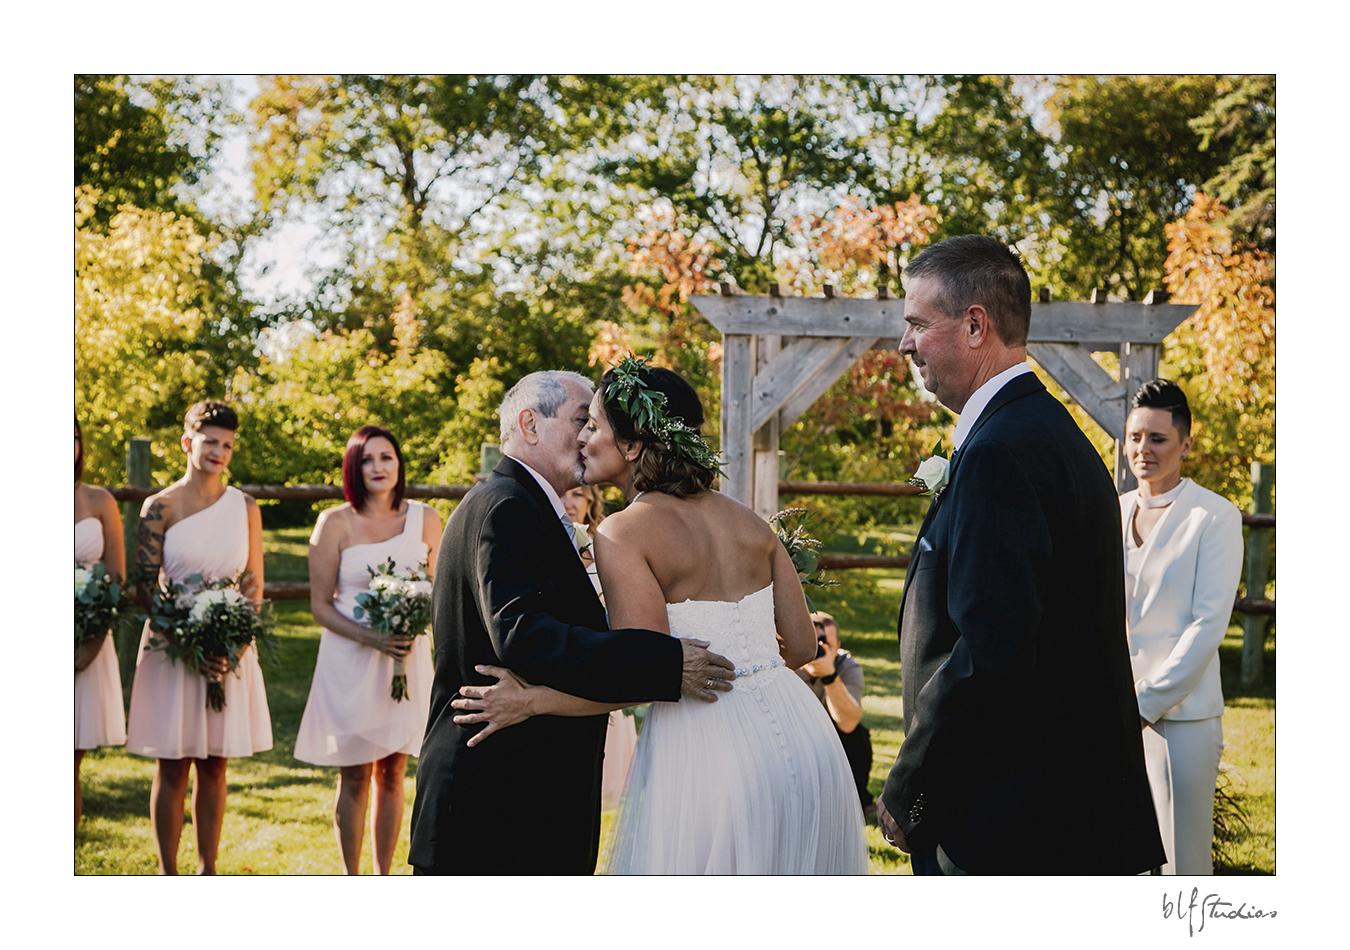 028-winnipeg-hitchnpost-wedding-marla-alana.jpg